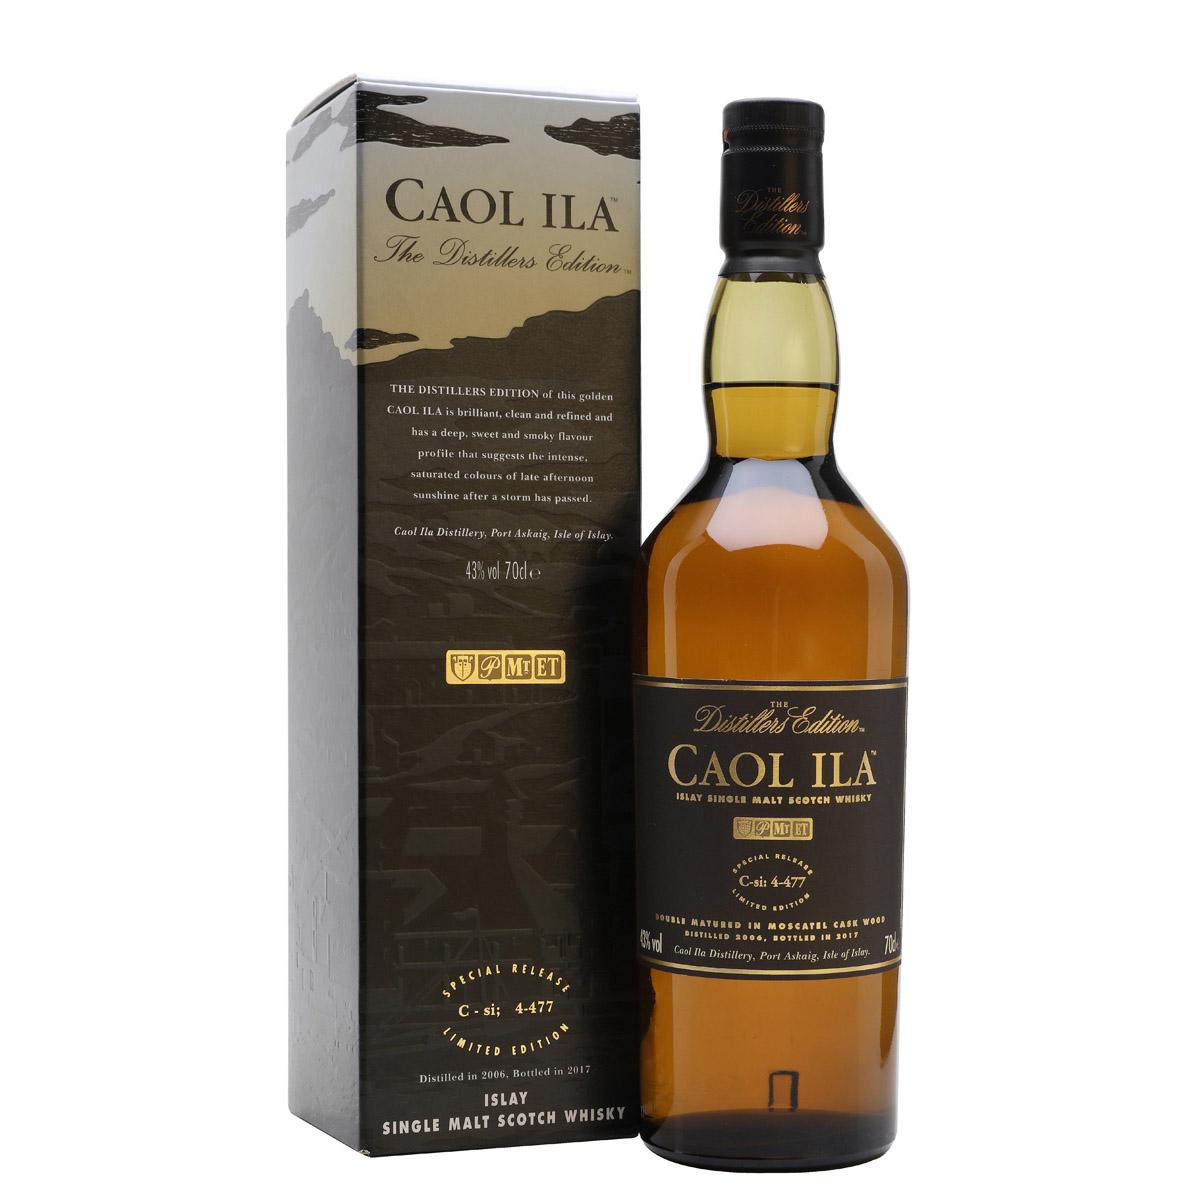 Caol Ila Distillers Edition 2006-2017 Single Malt Scotch Whisky